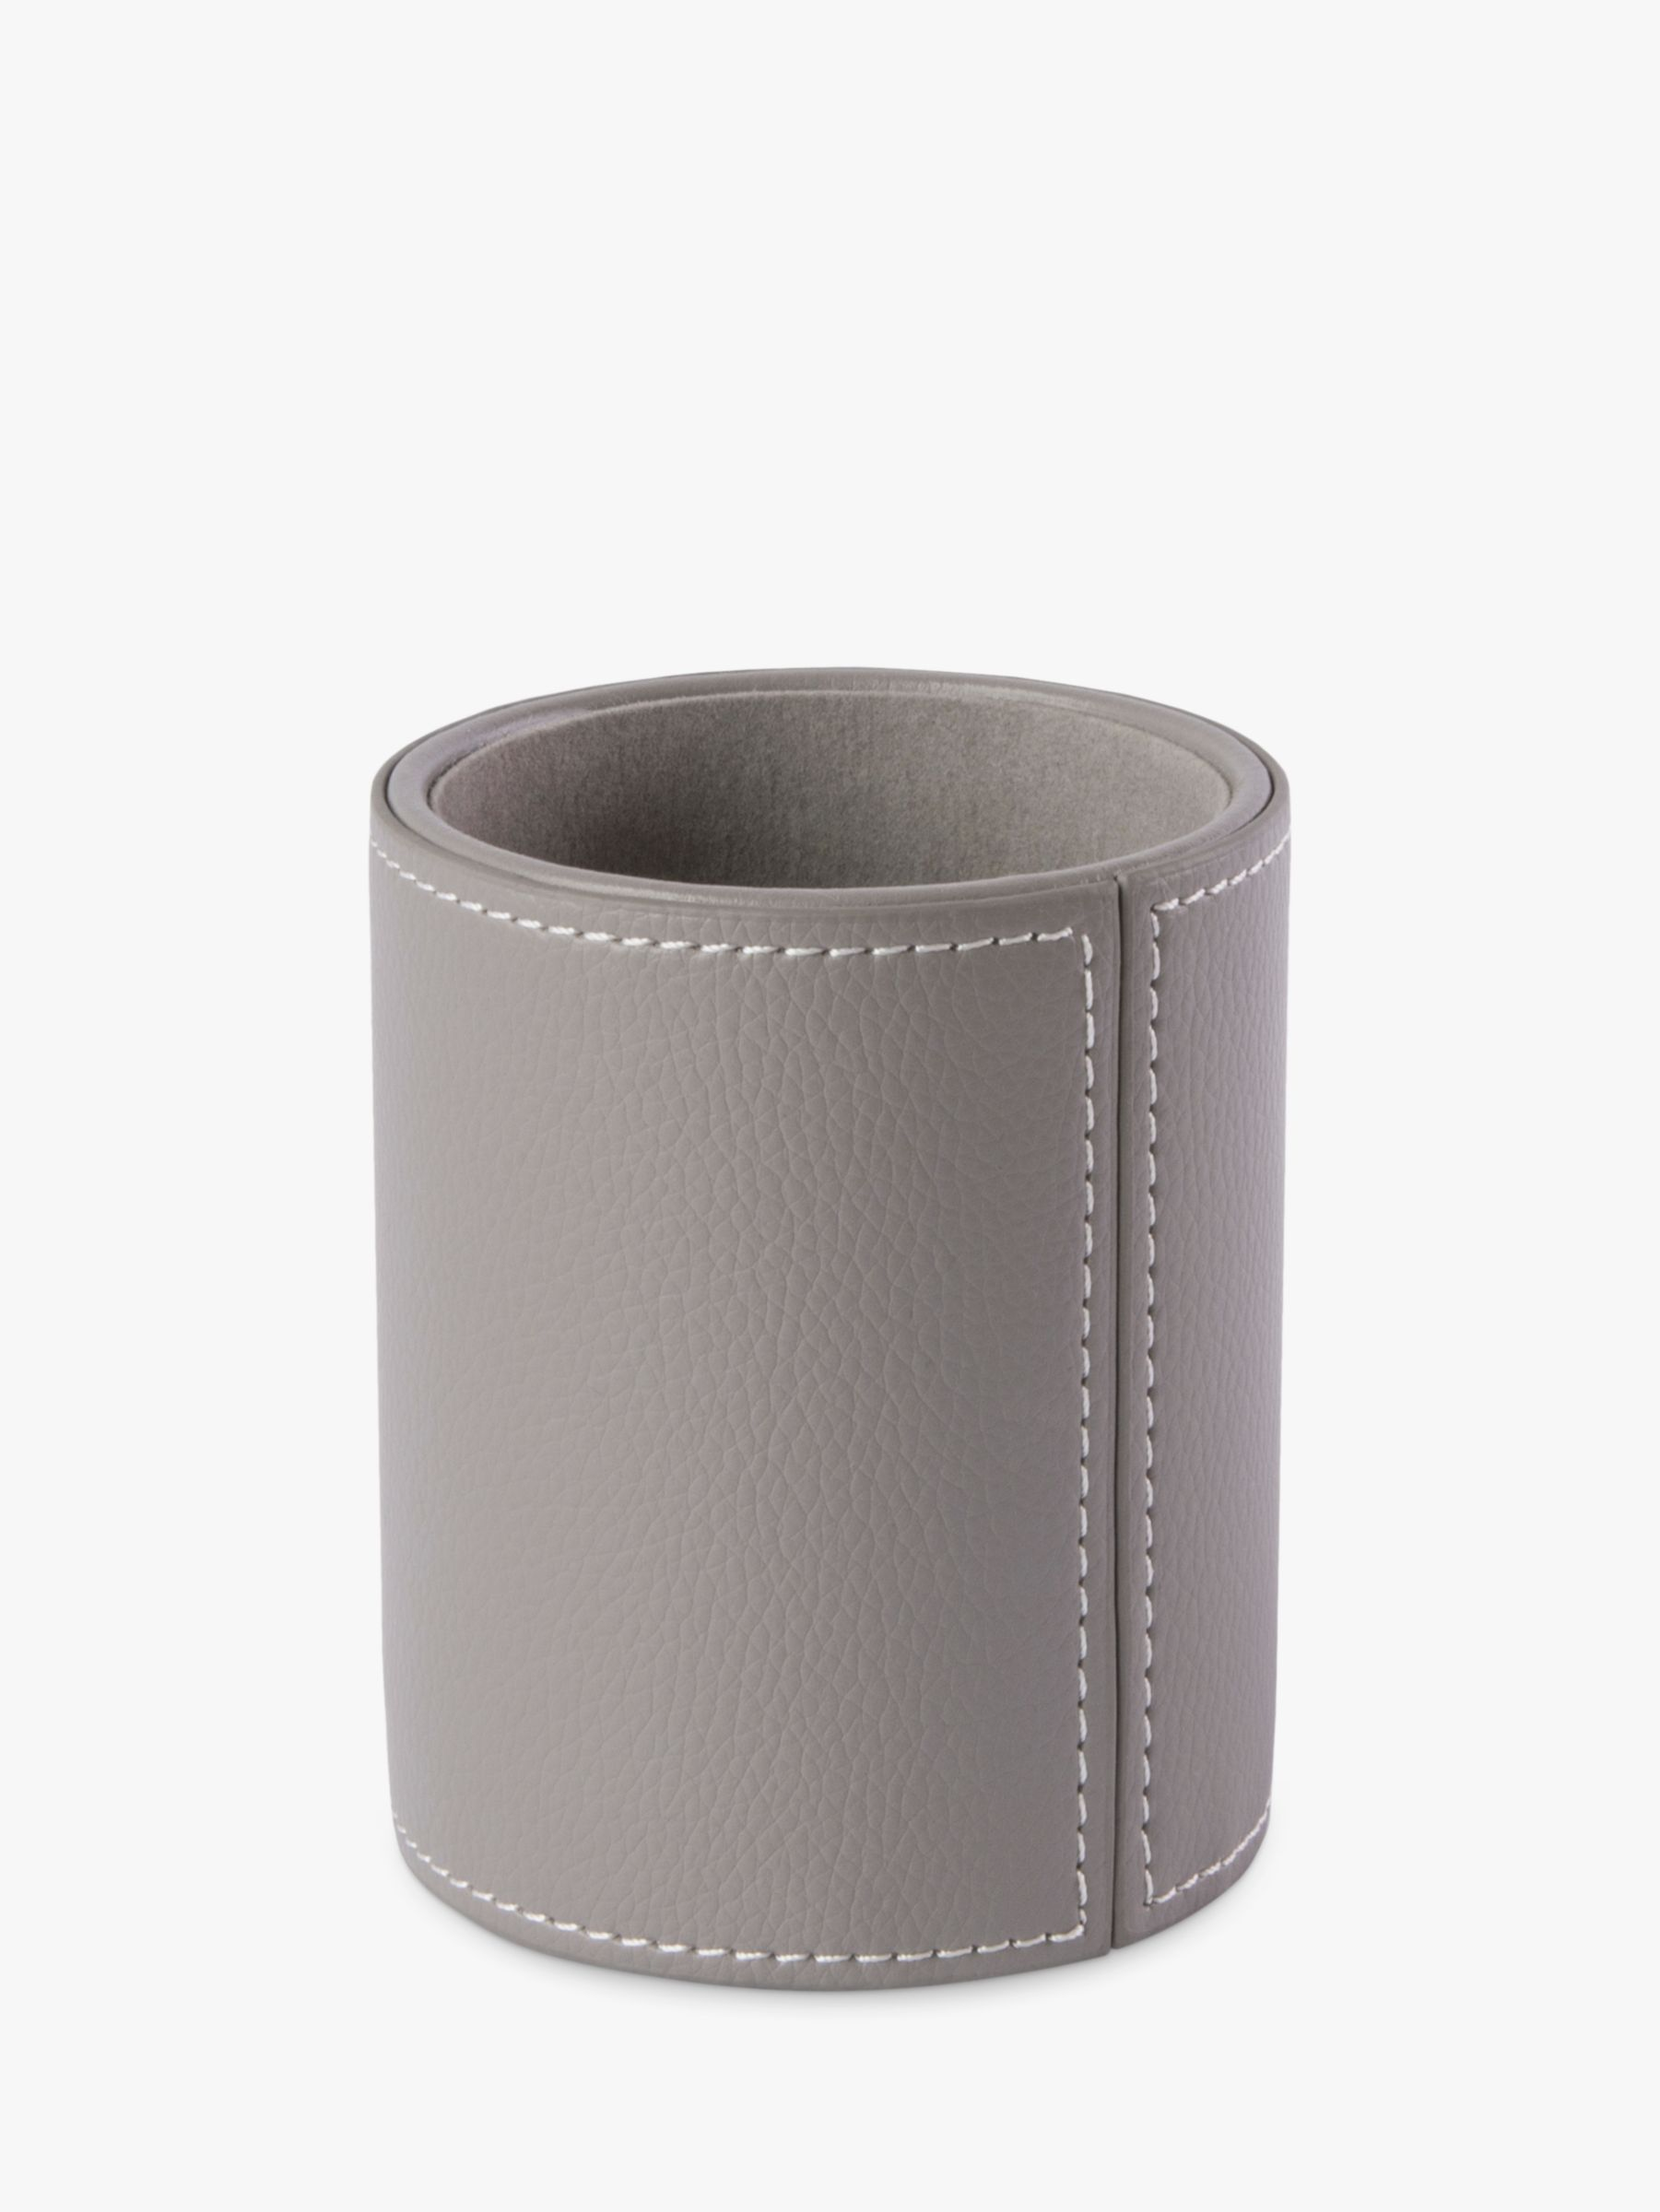 Osco Osco Faux Leather Pen Pot